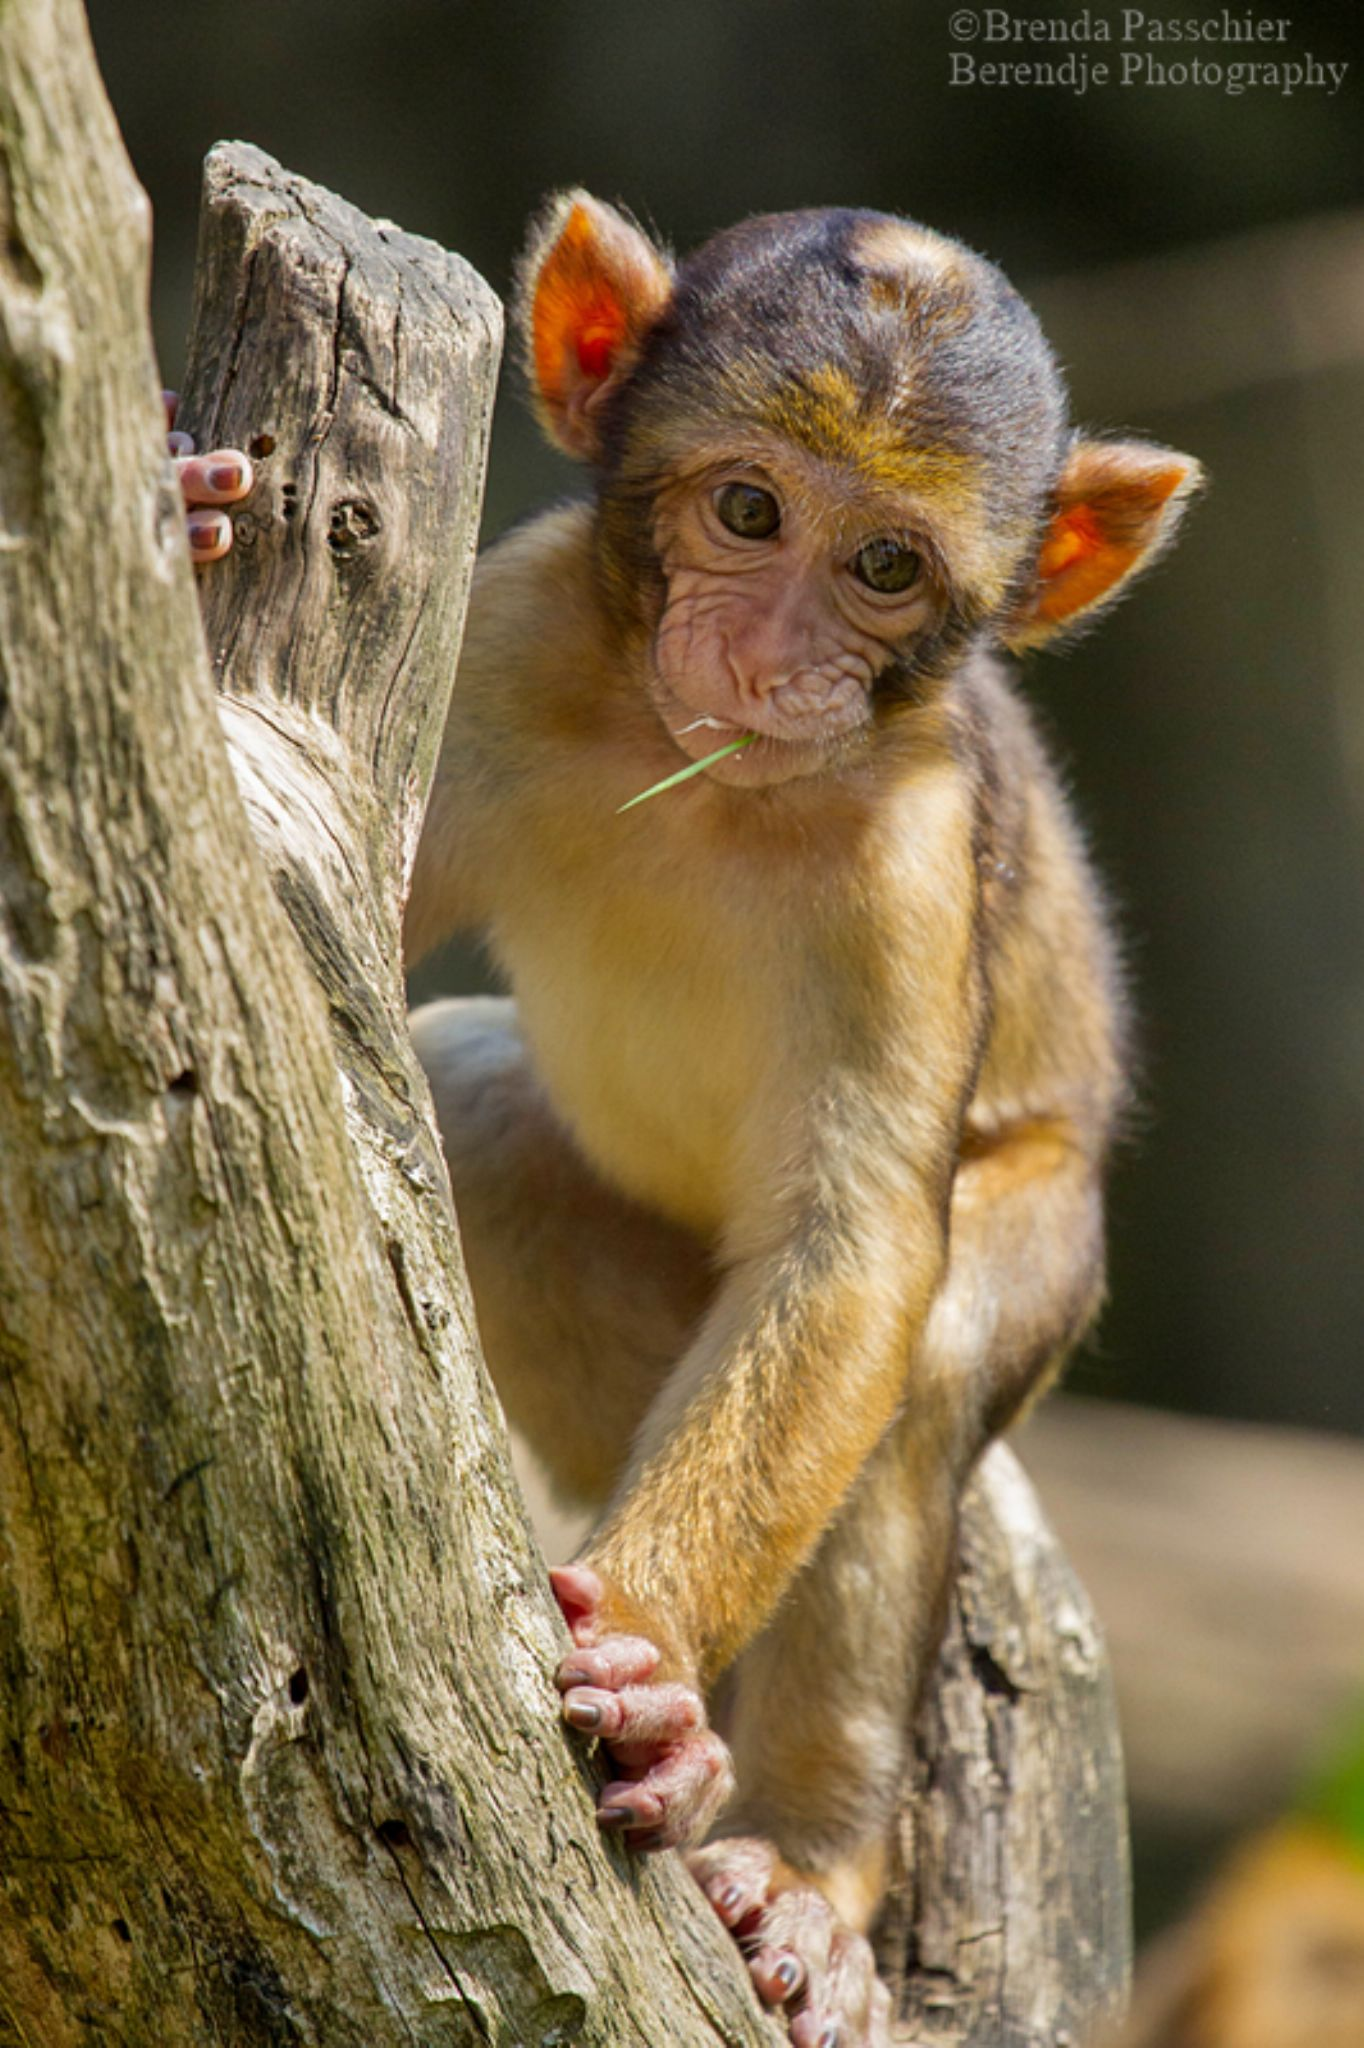 Barbary macaque by Brenda Passchier